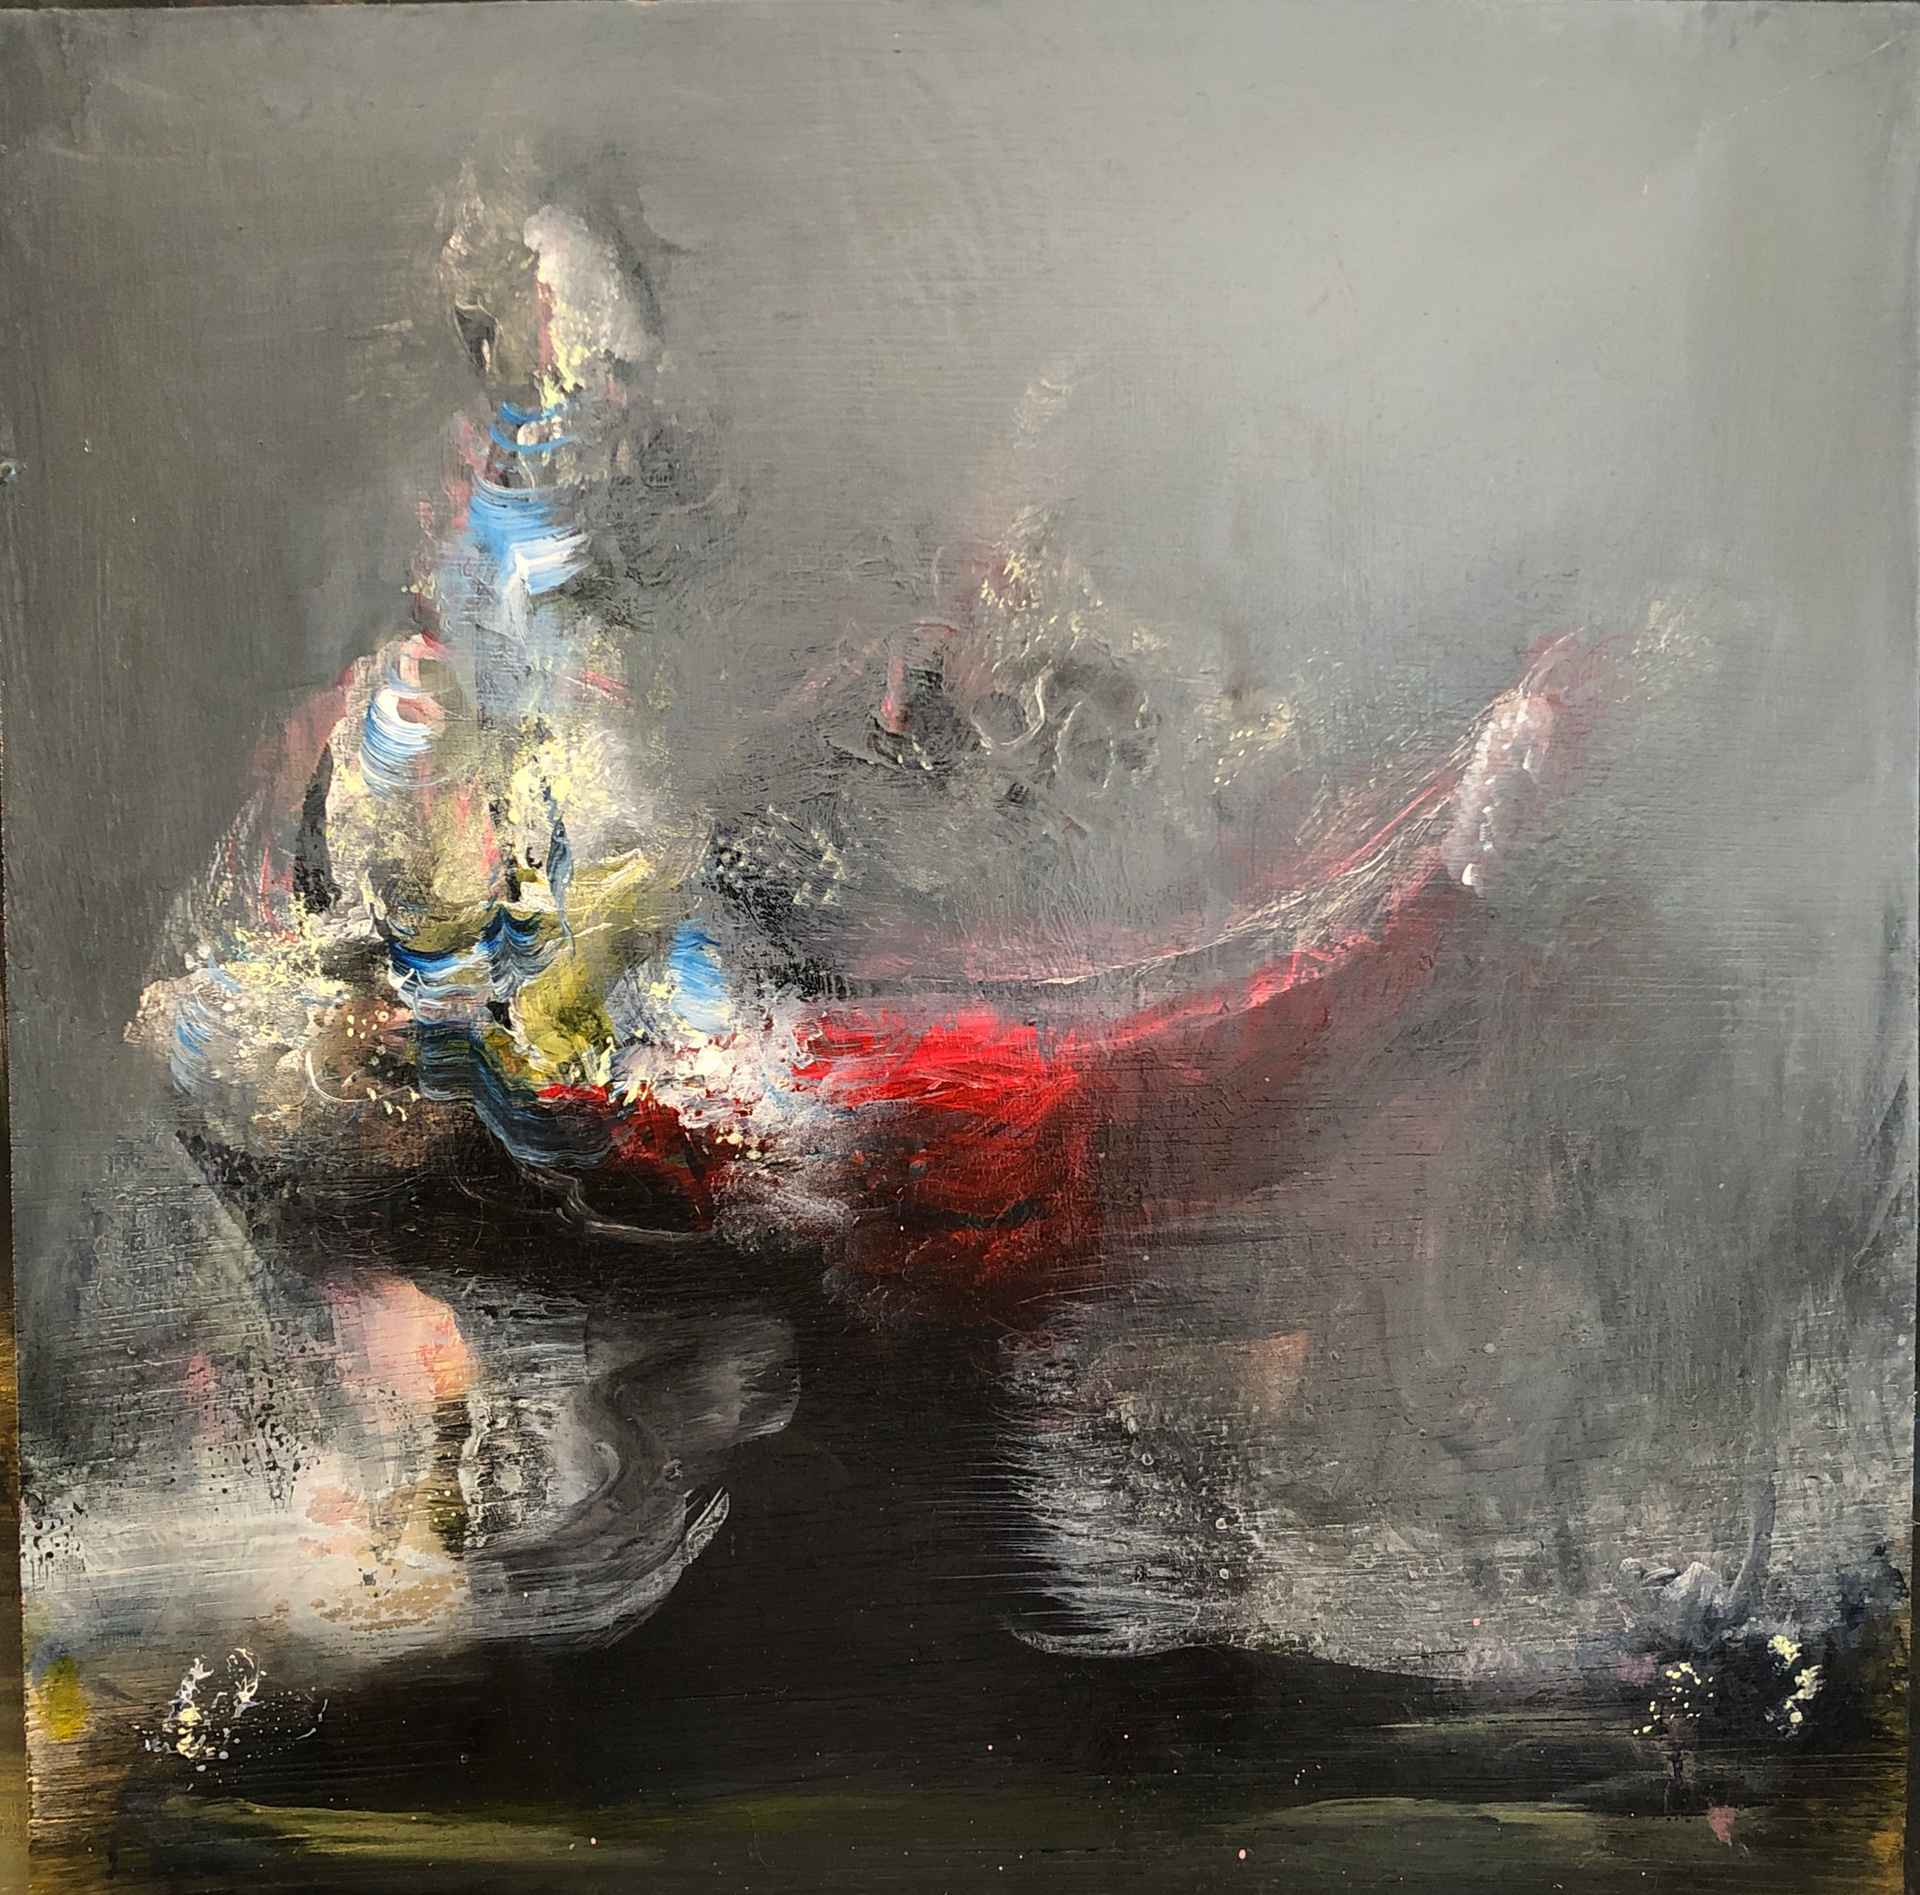 'Journey among worlds' by Ian Rayer-Smith